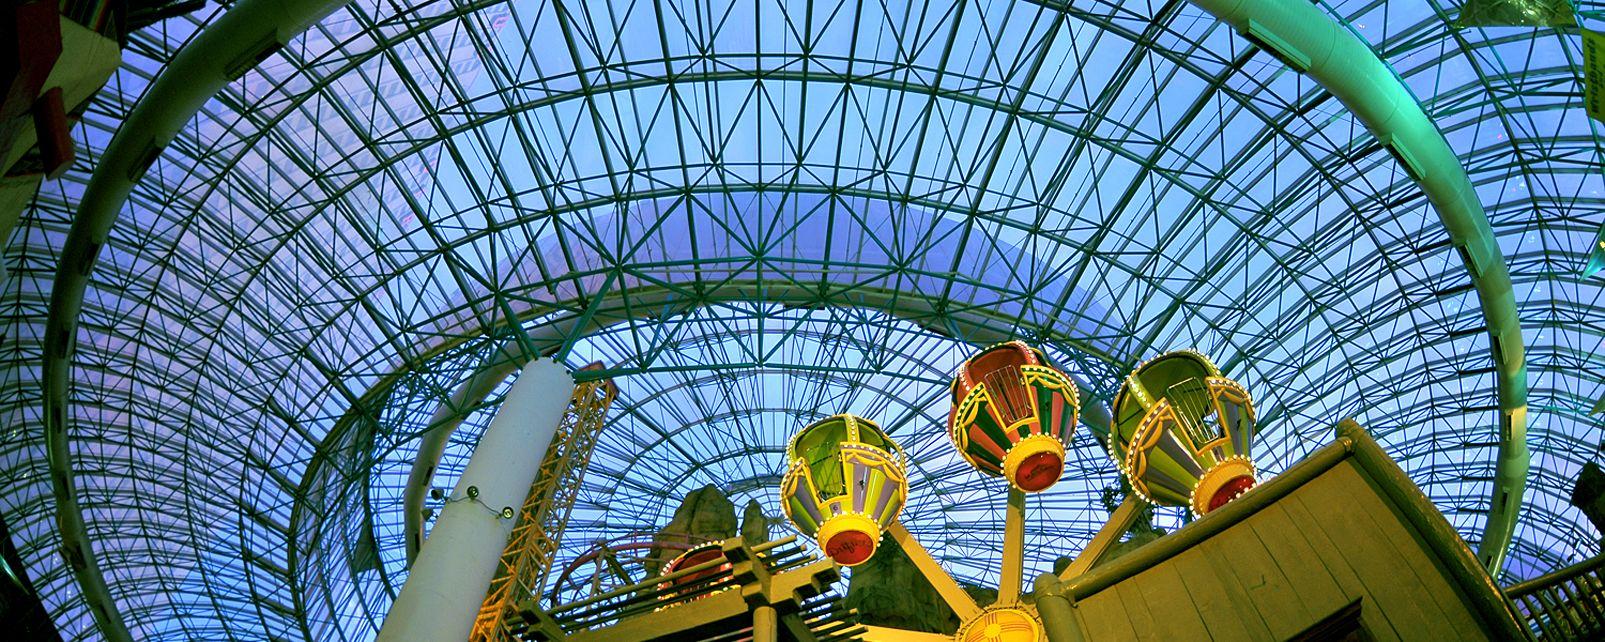 hotel circus circus las vegas bewertung